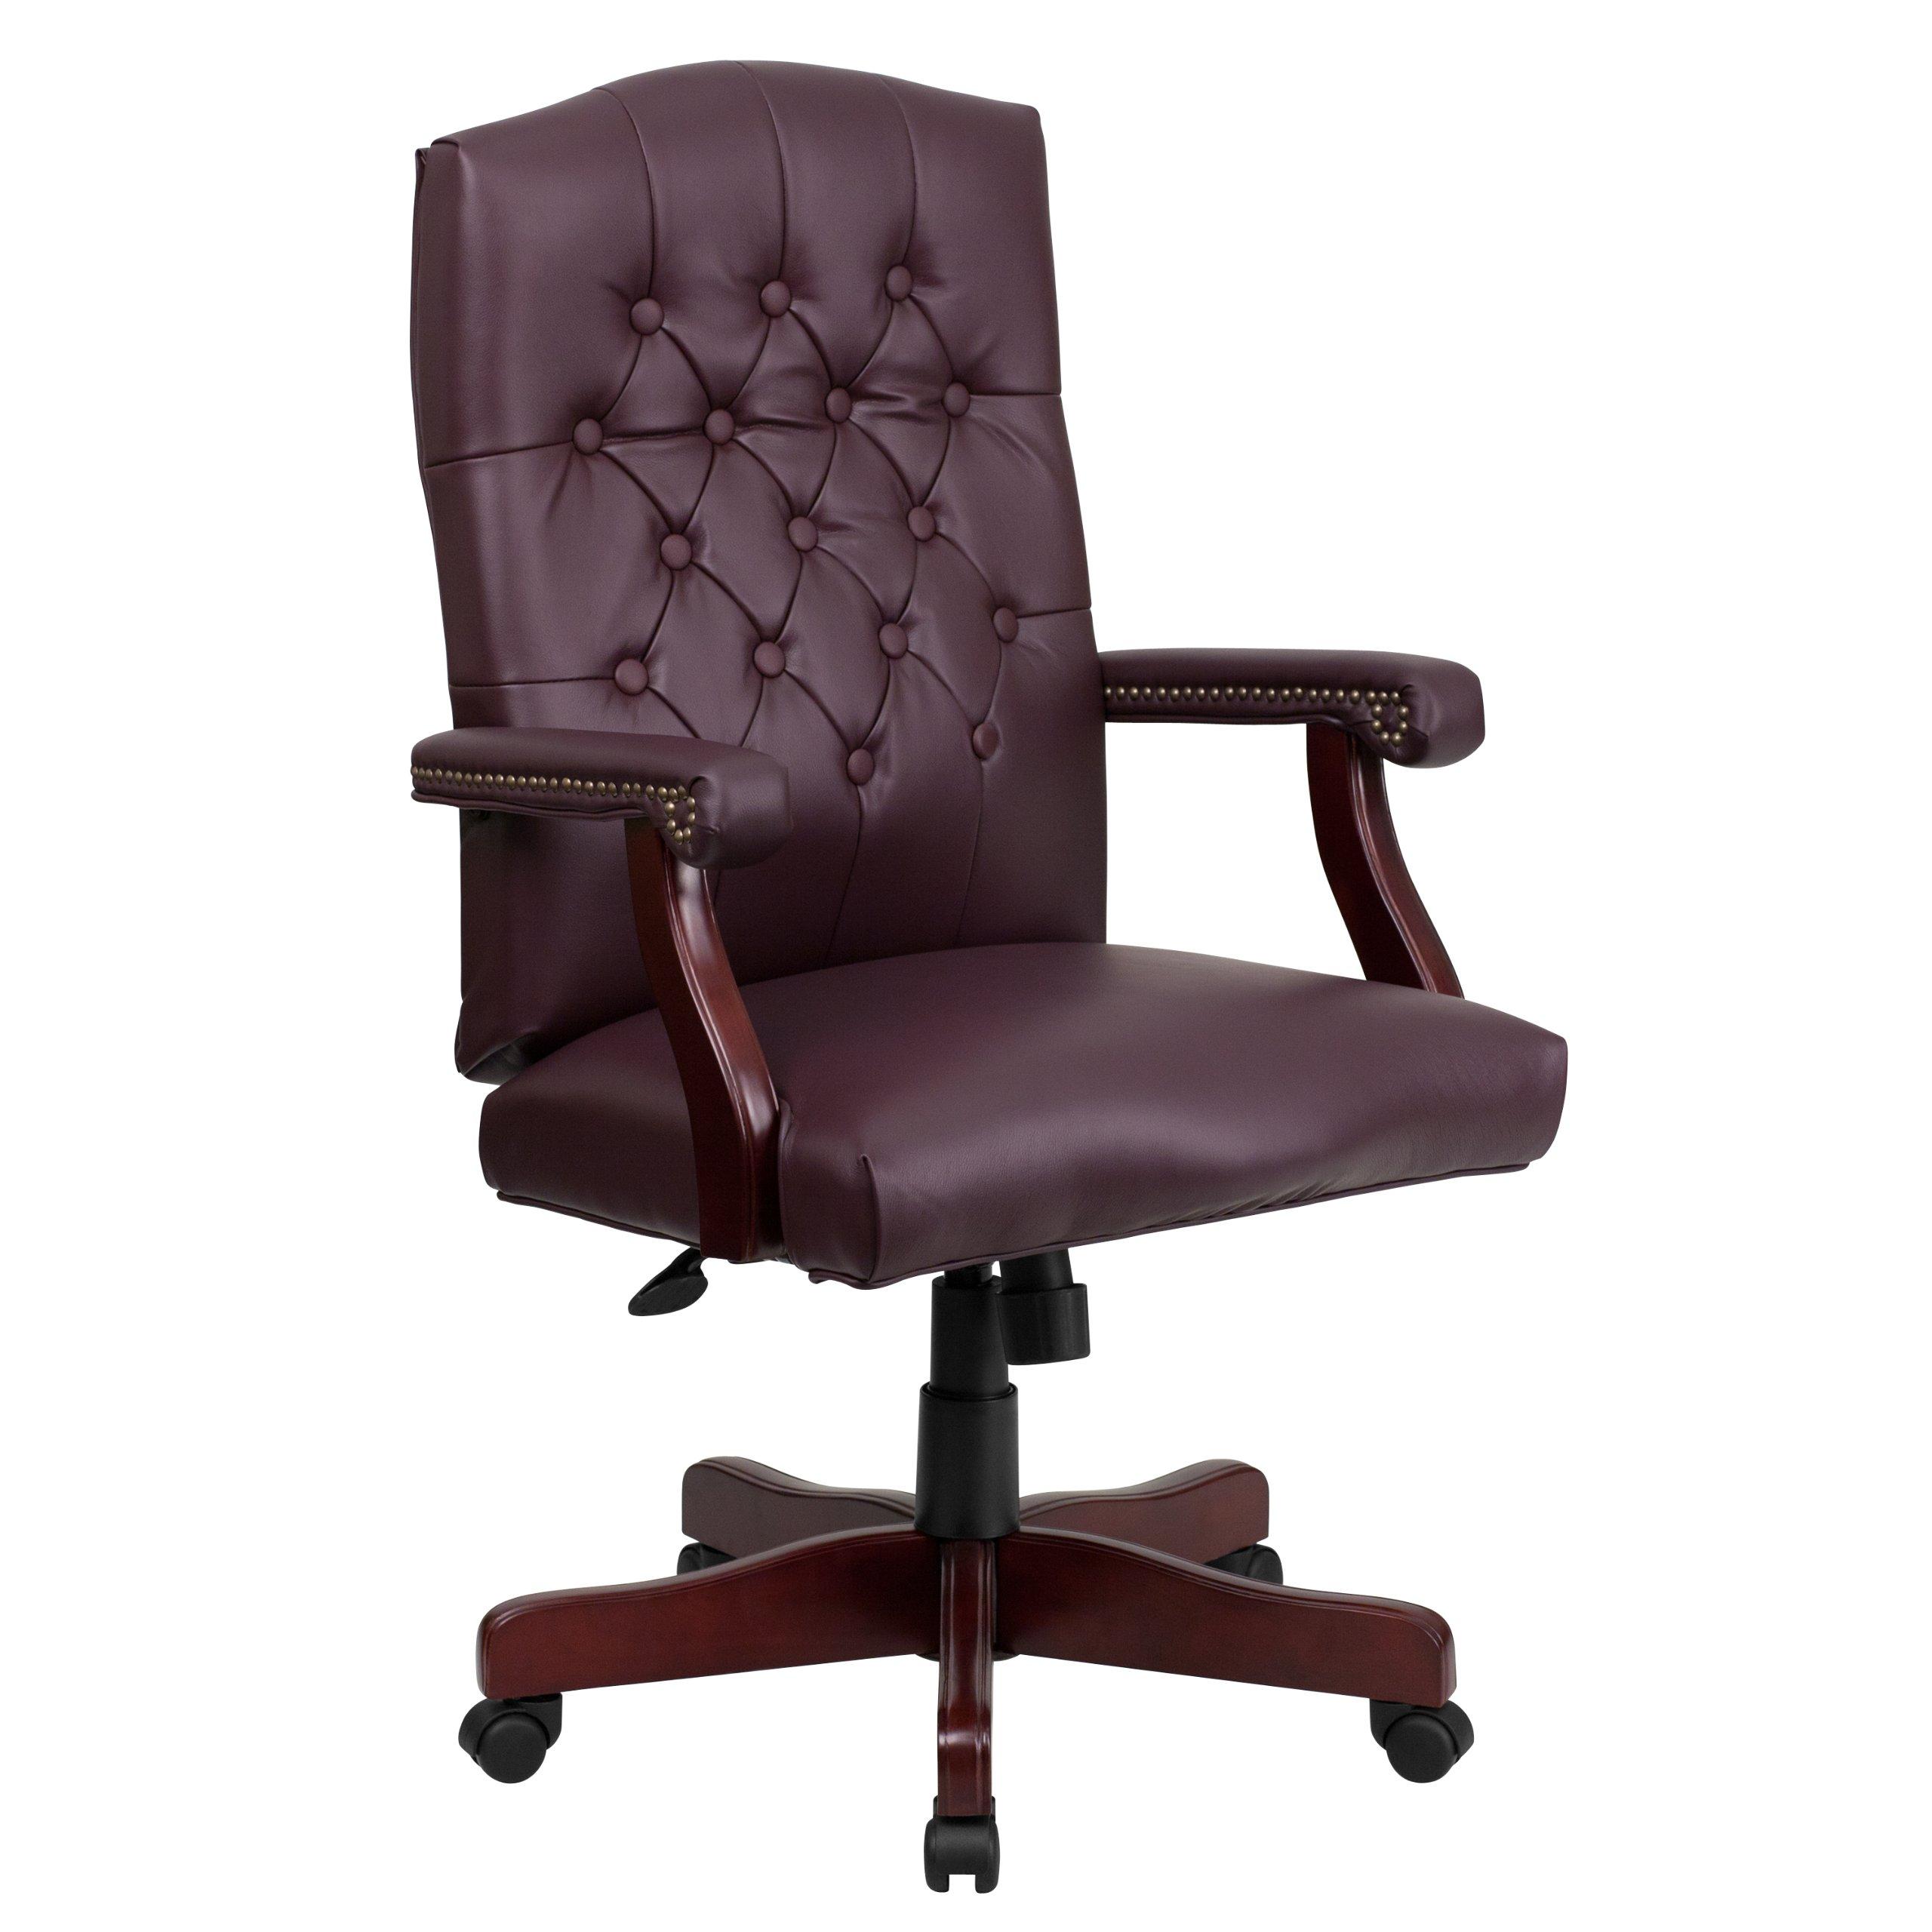 Flash Furniture Martha Washington Burgundy Leather Executive Swivel Chair with Arms